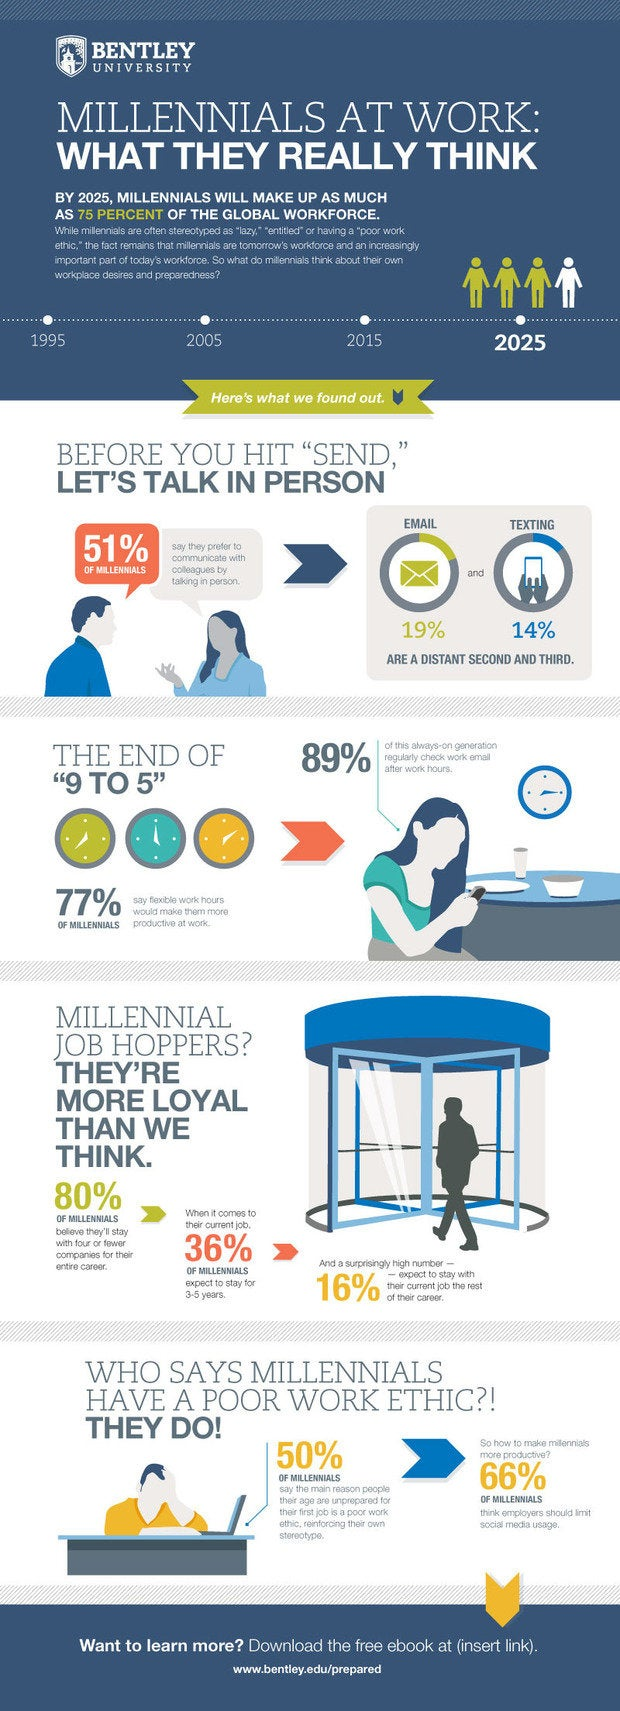 bentley infographic millennials at work nov 2014